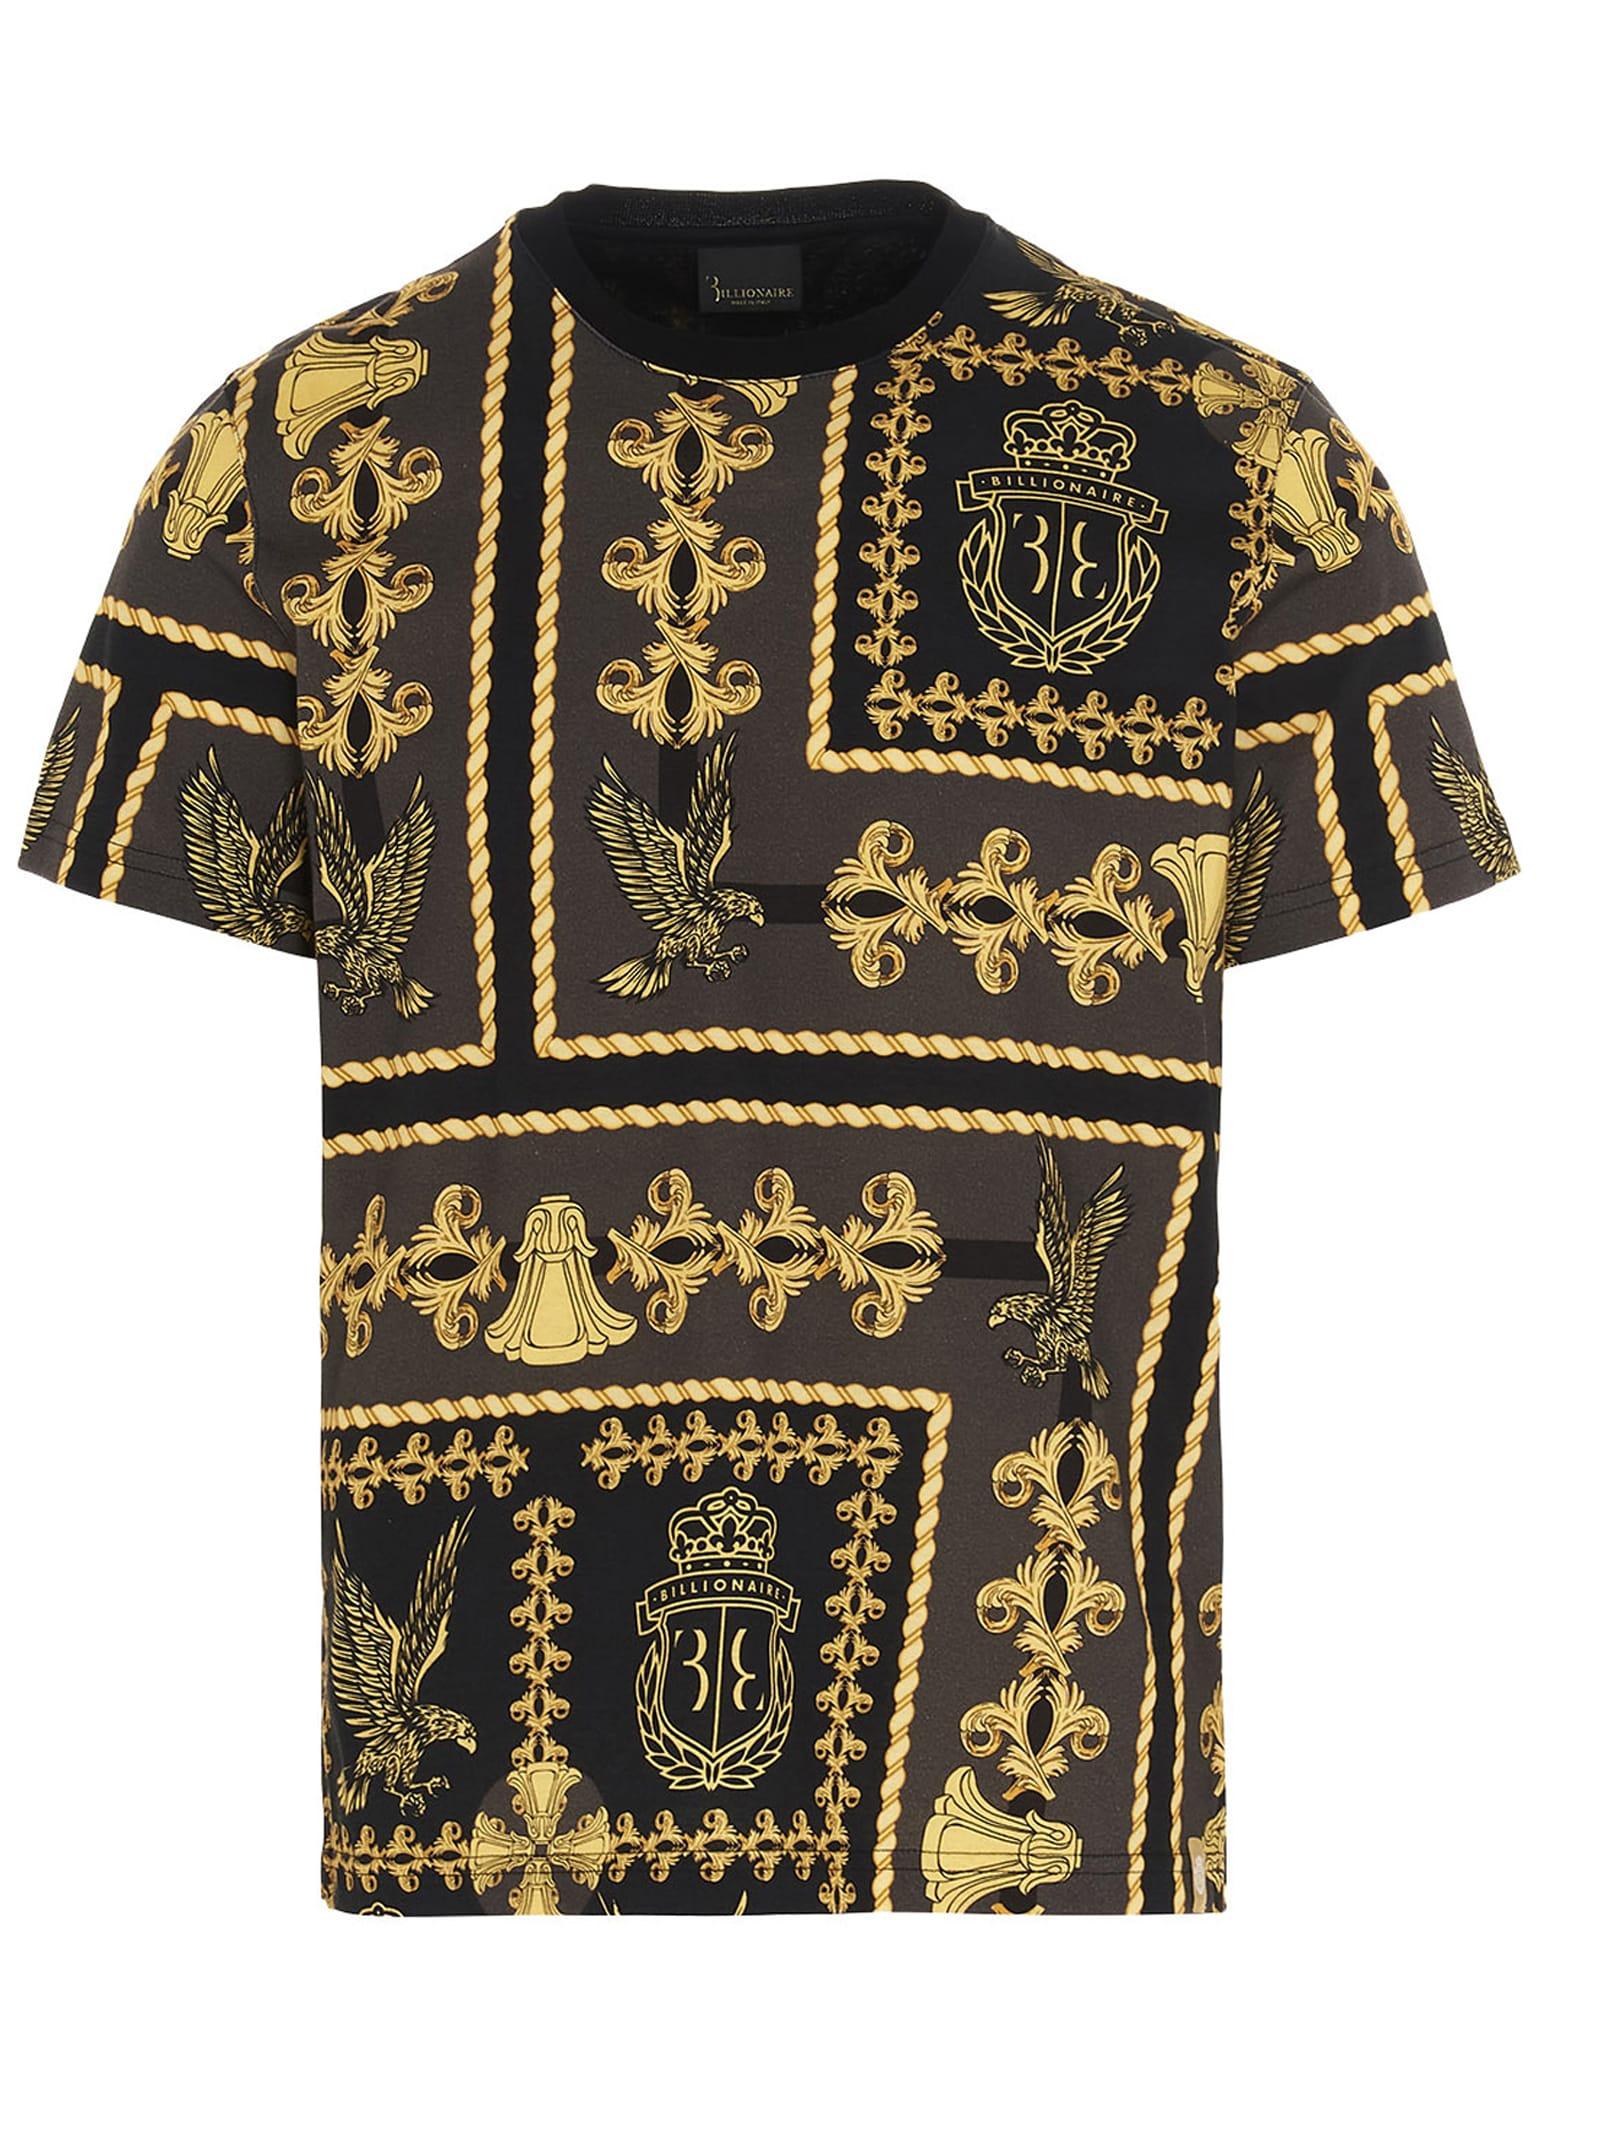 Billionaire Shirts FALCON T-SHIRT